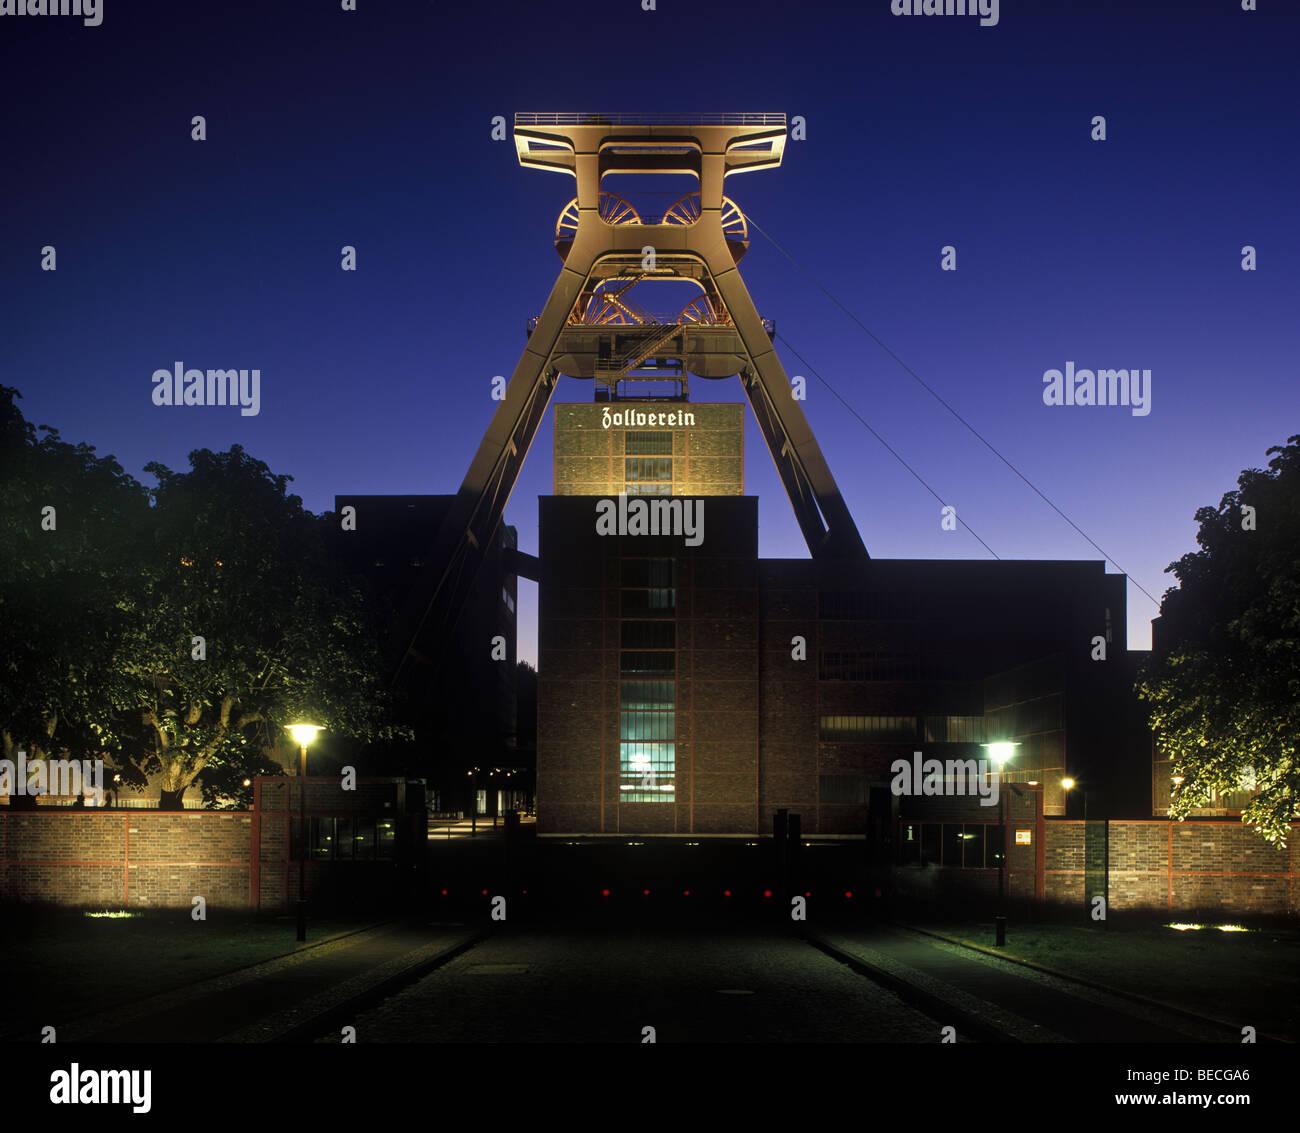 Zollverein Coal Mine Industrial Complex at night, Essen, North Rhine-Westphalia, Germany, Europe - Stock Image